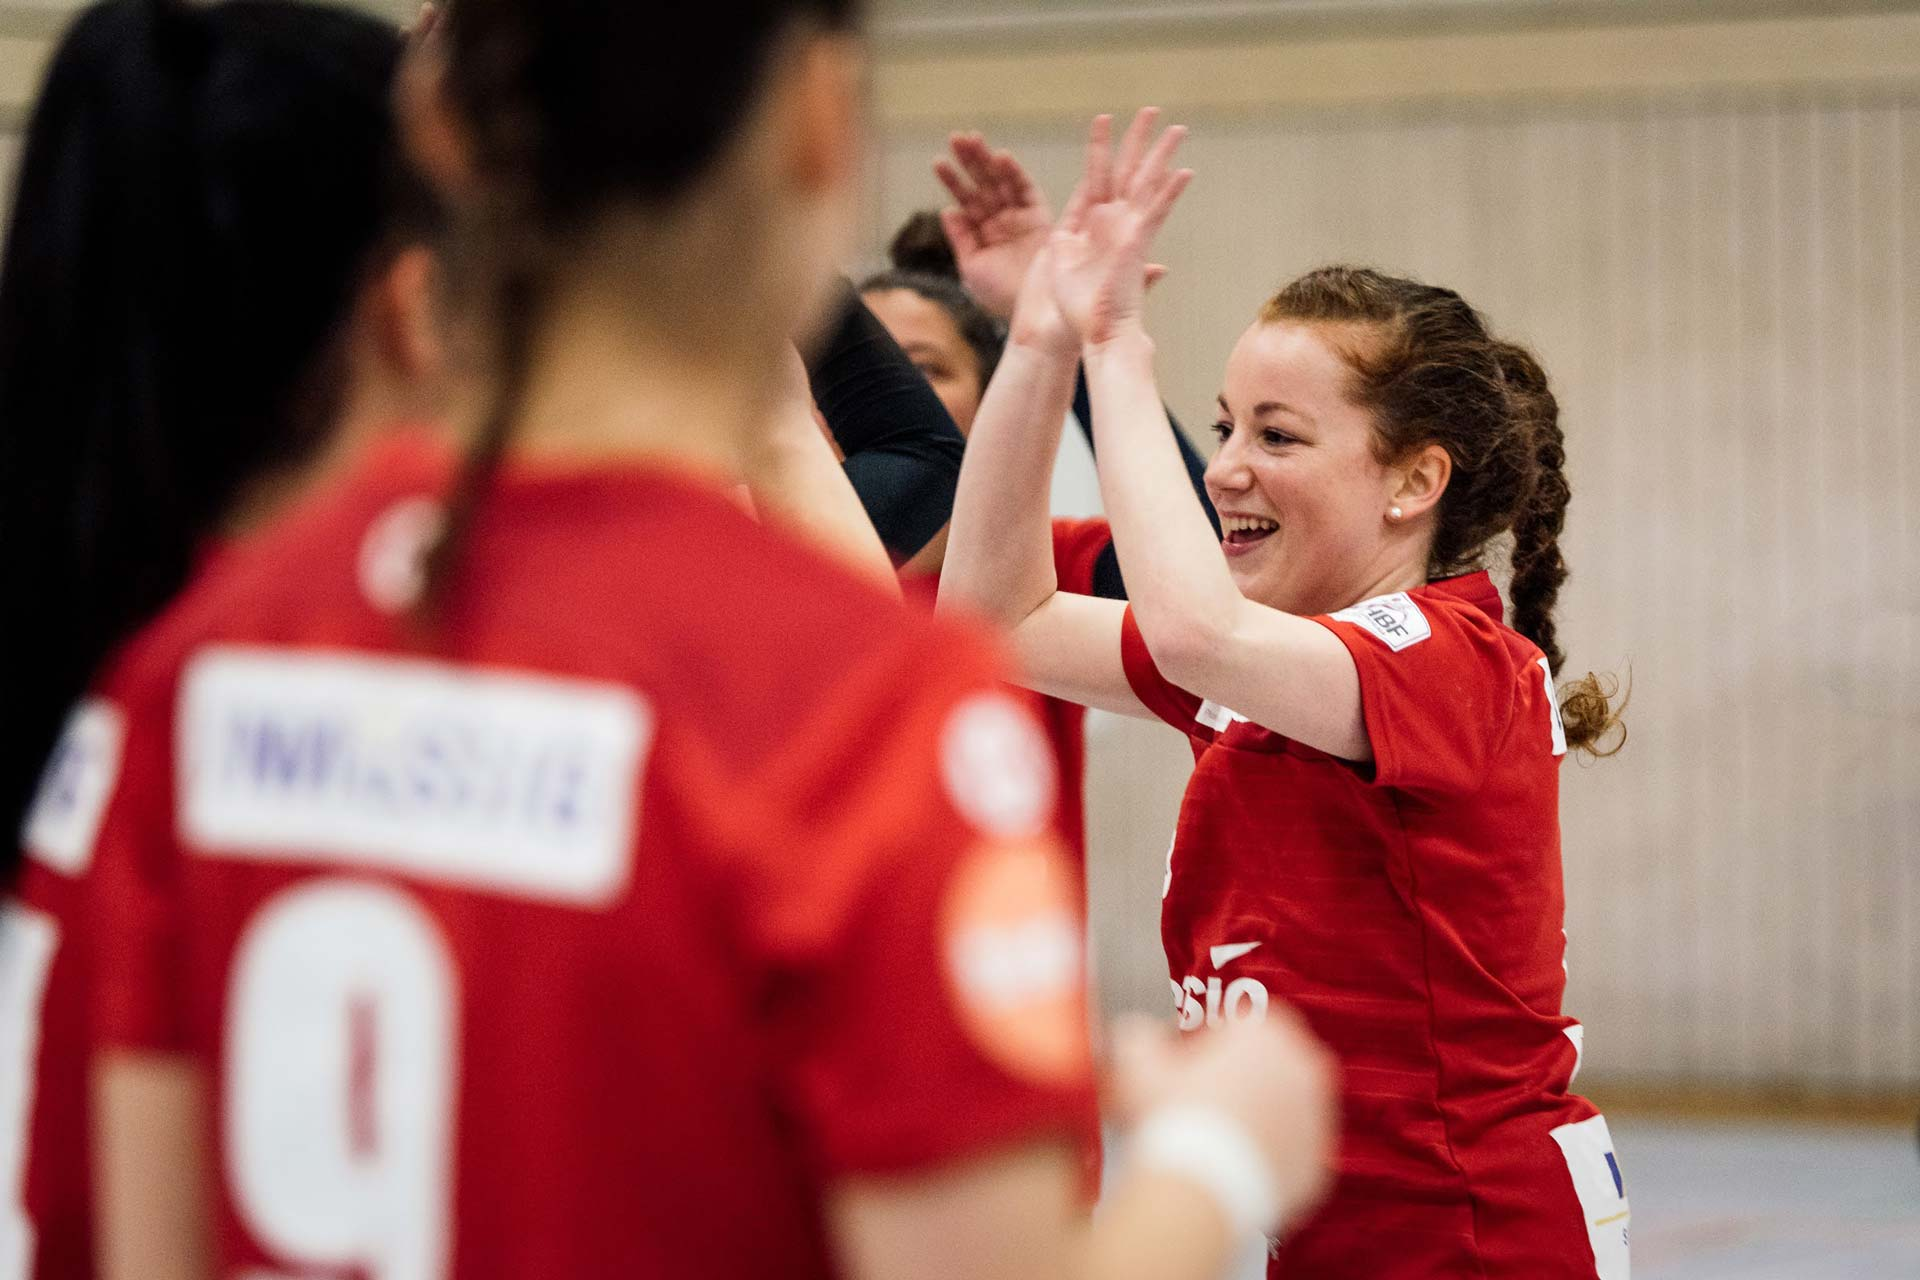 Julia Söhne beim Abklatschen im Teamsport Handball